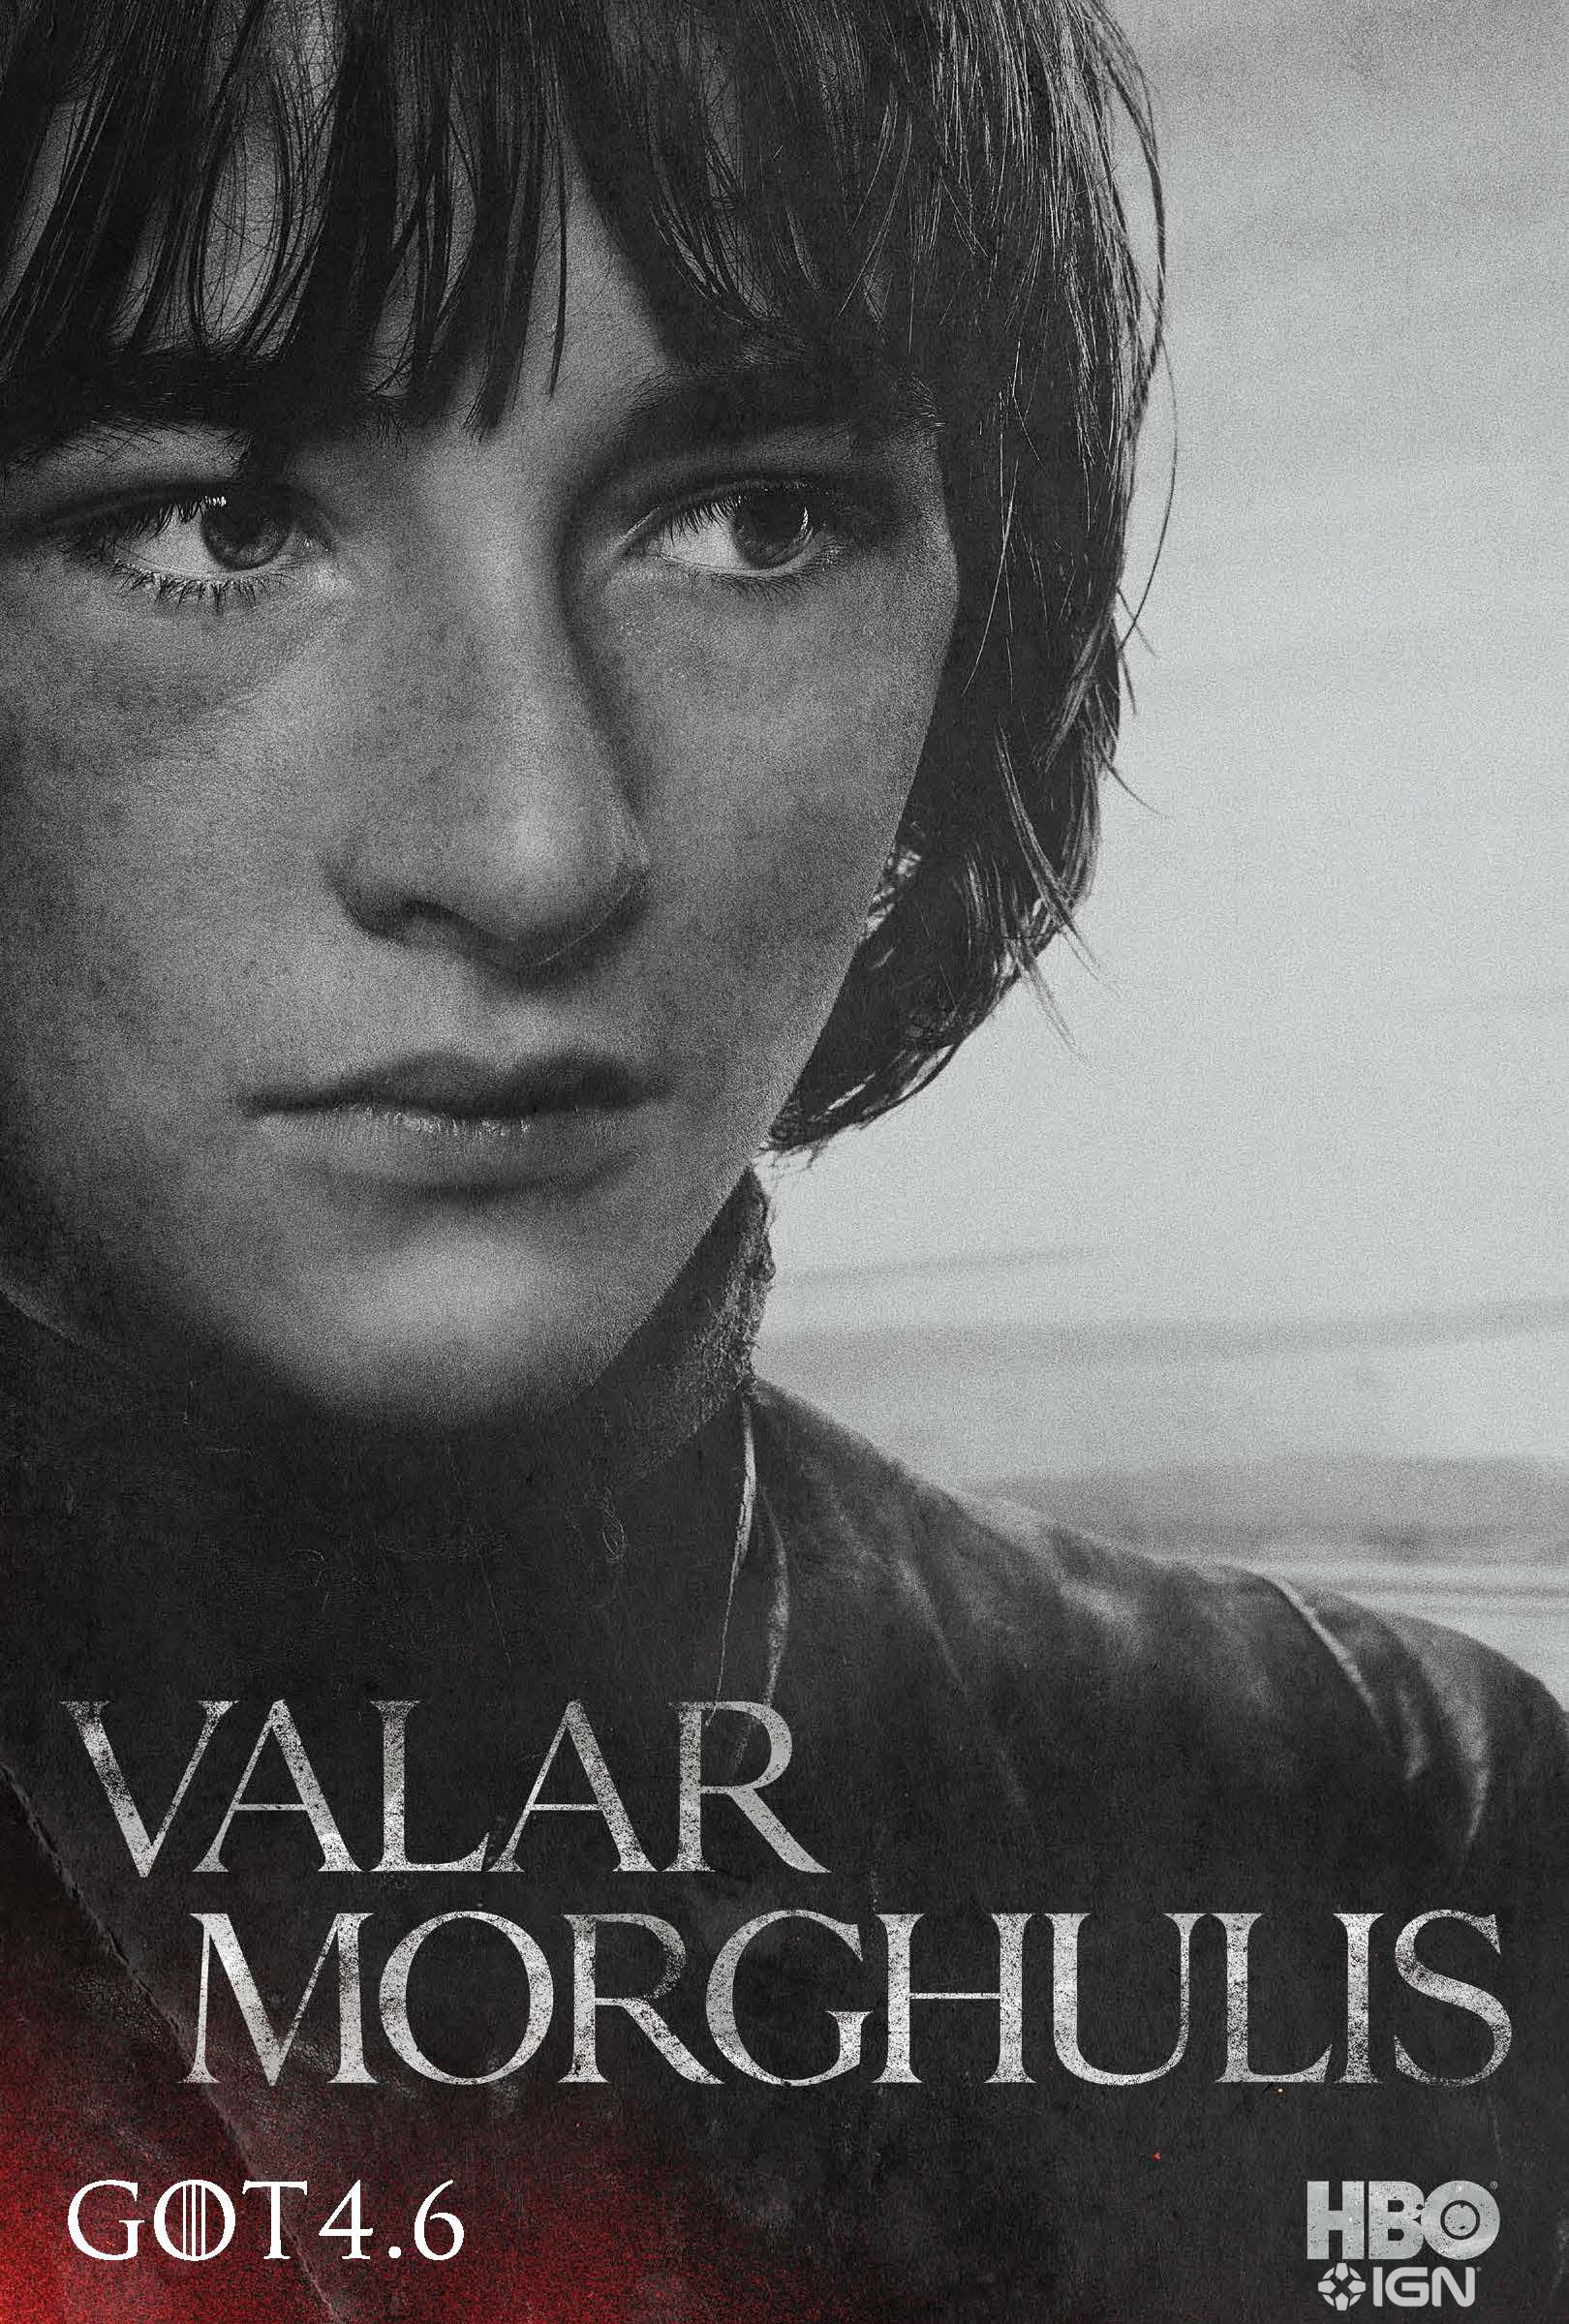 Bran Stark - Character poster